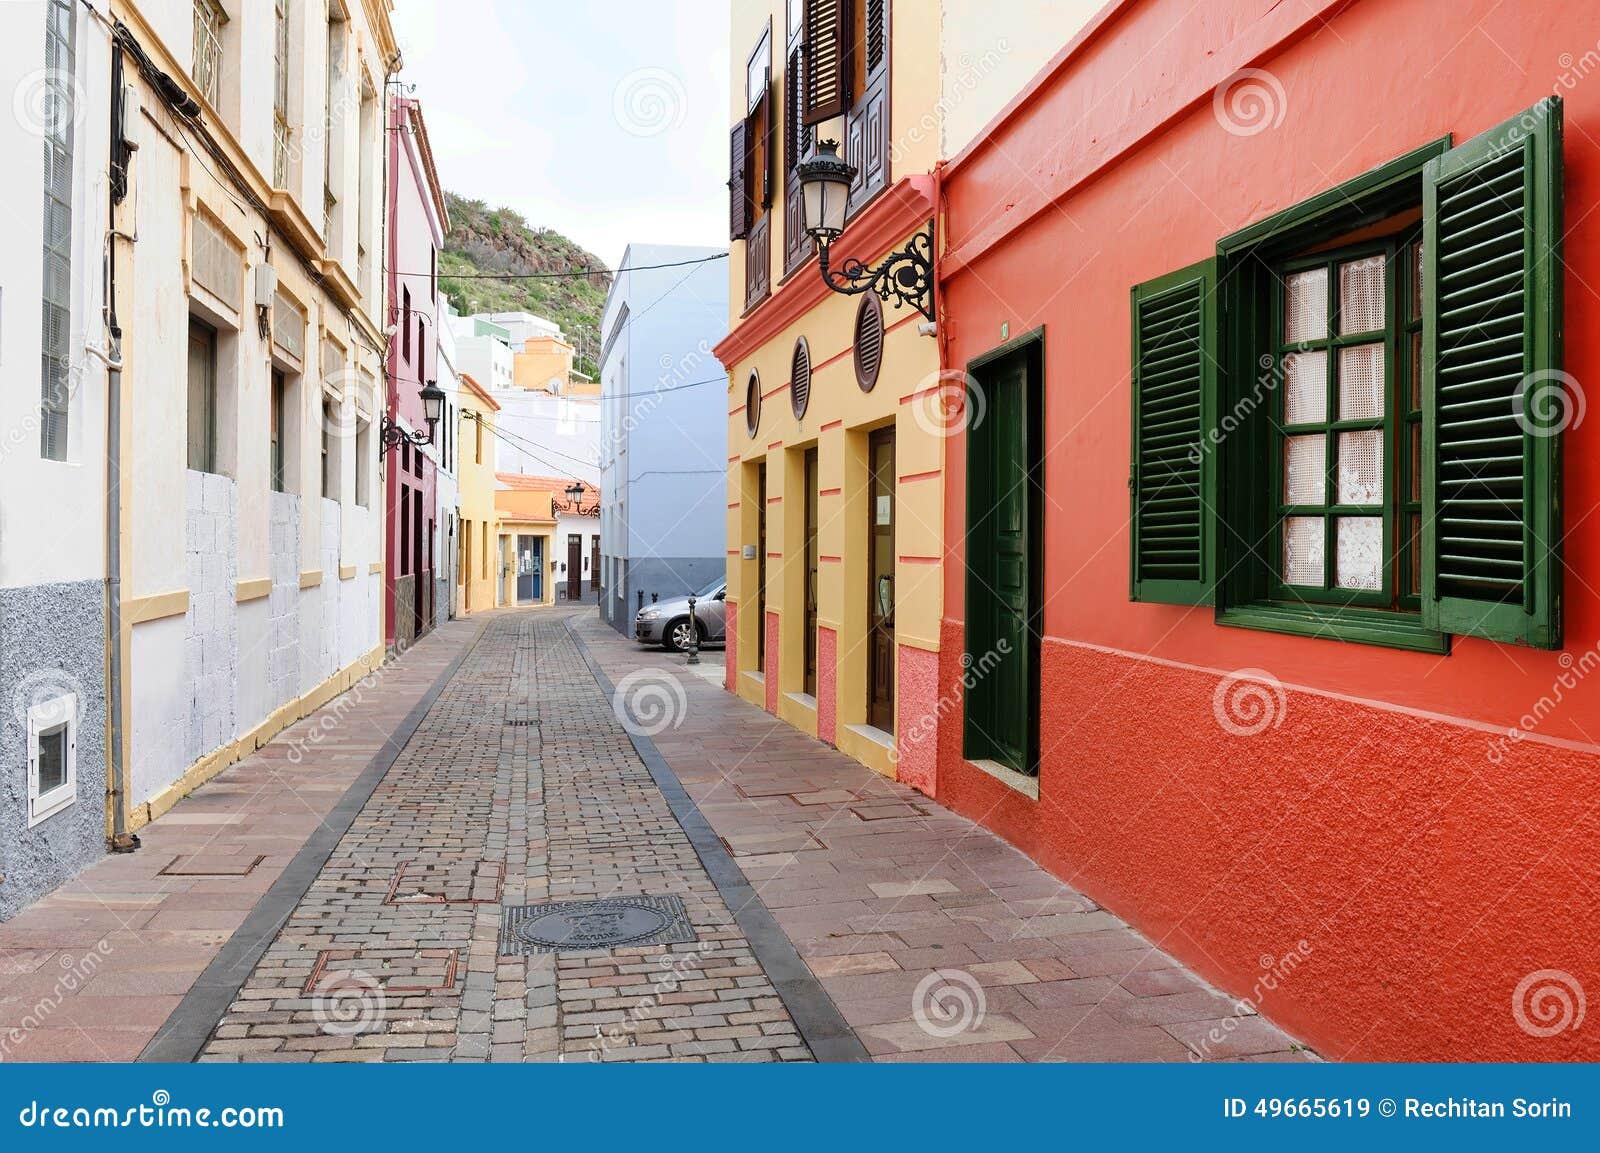 Dettaglio architettonico in San Sebastian de la Gomera